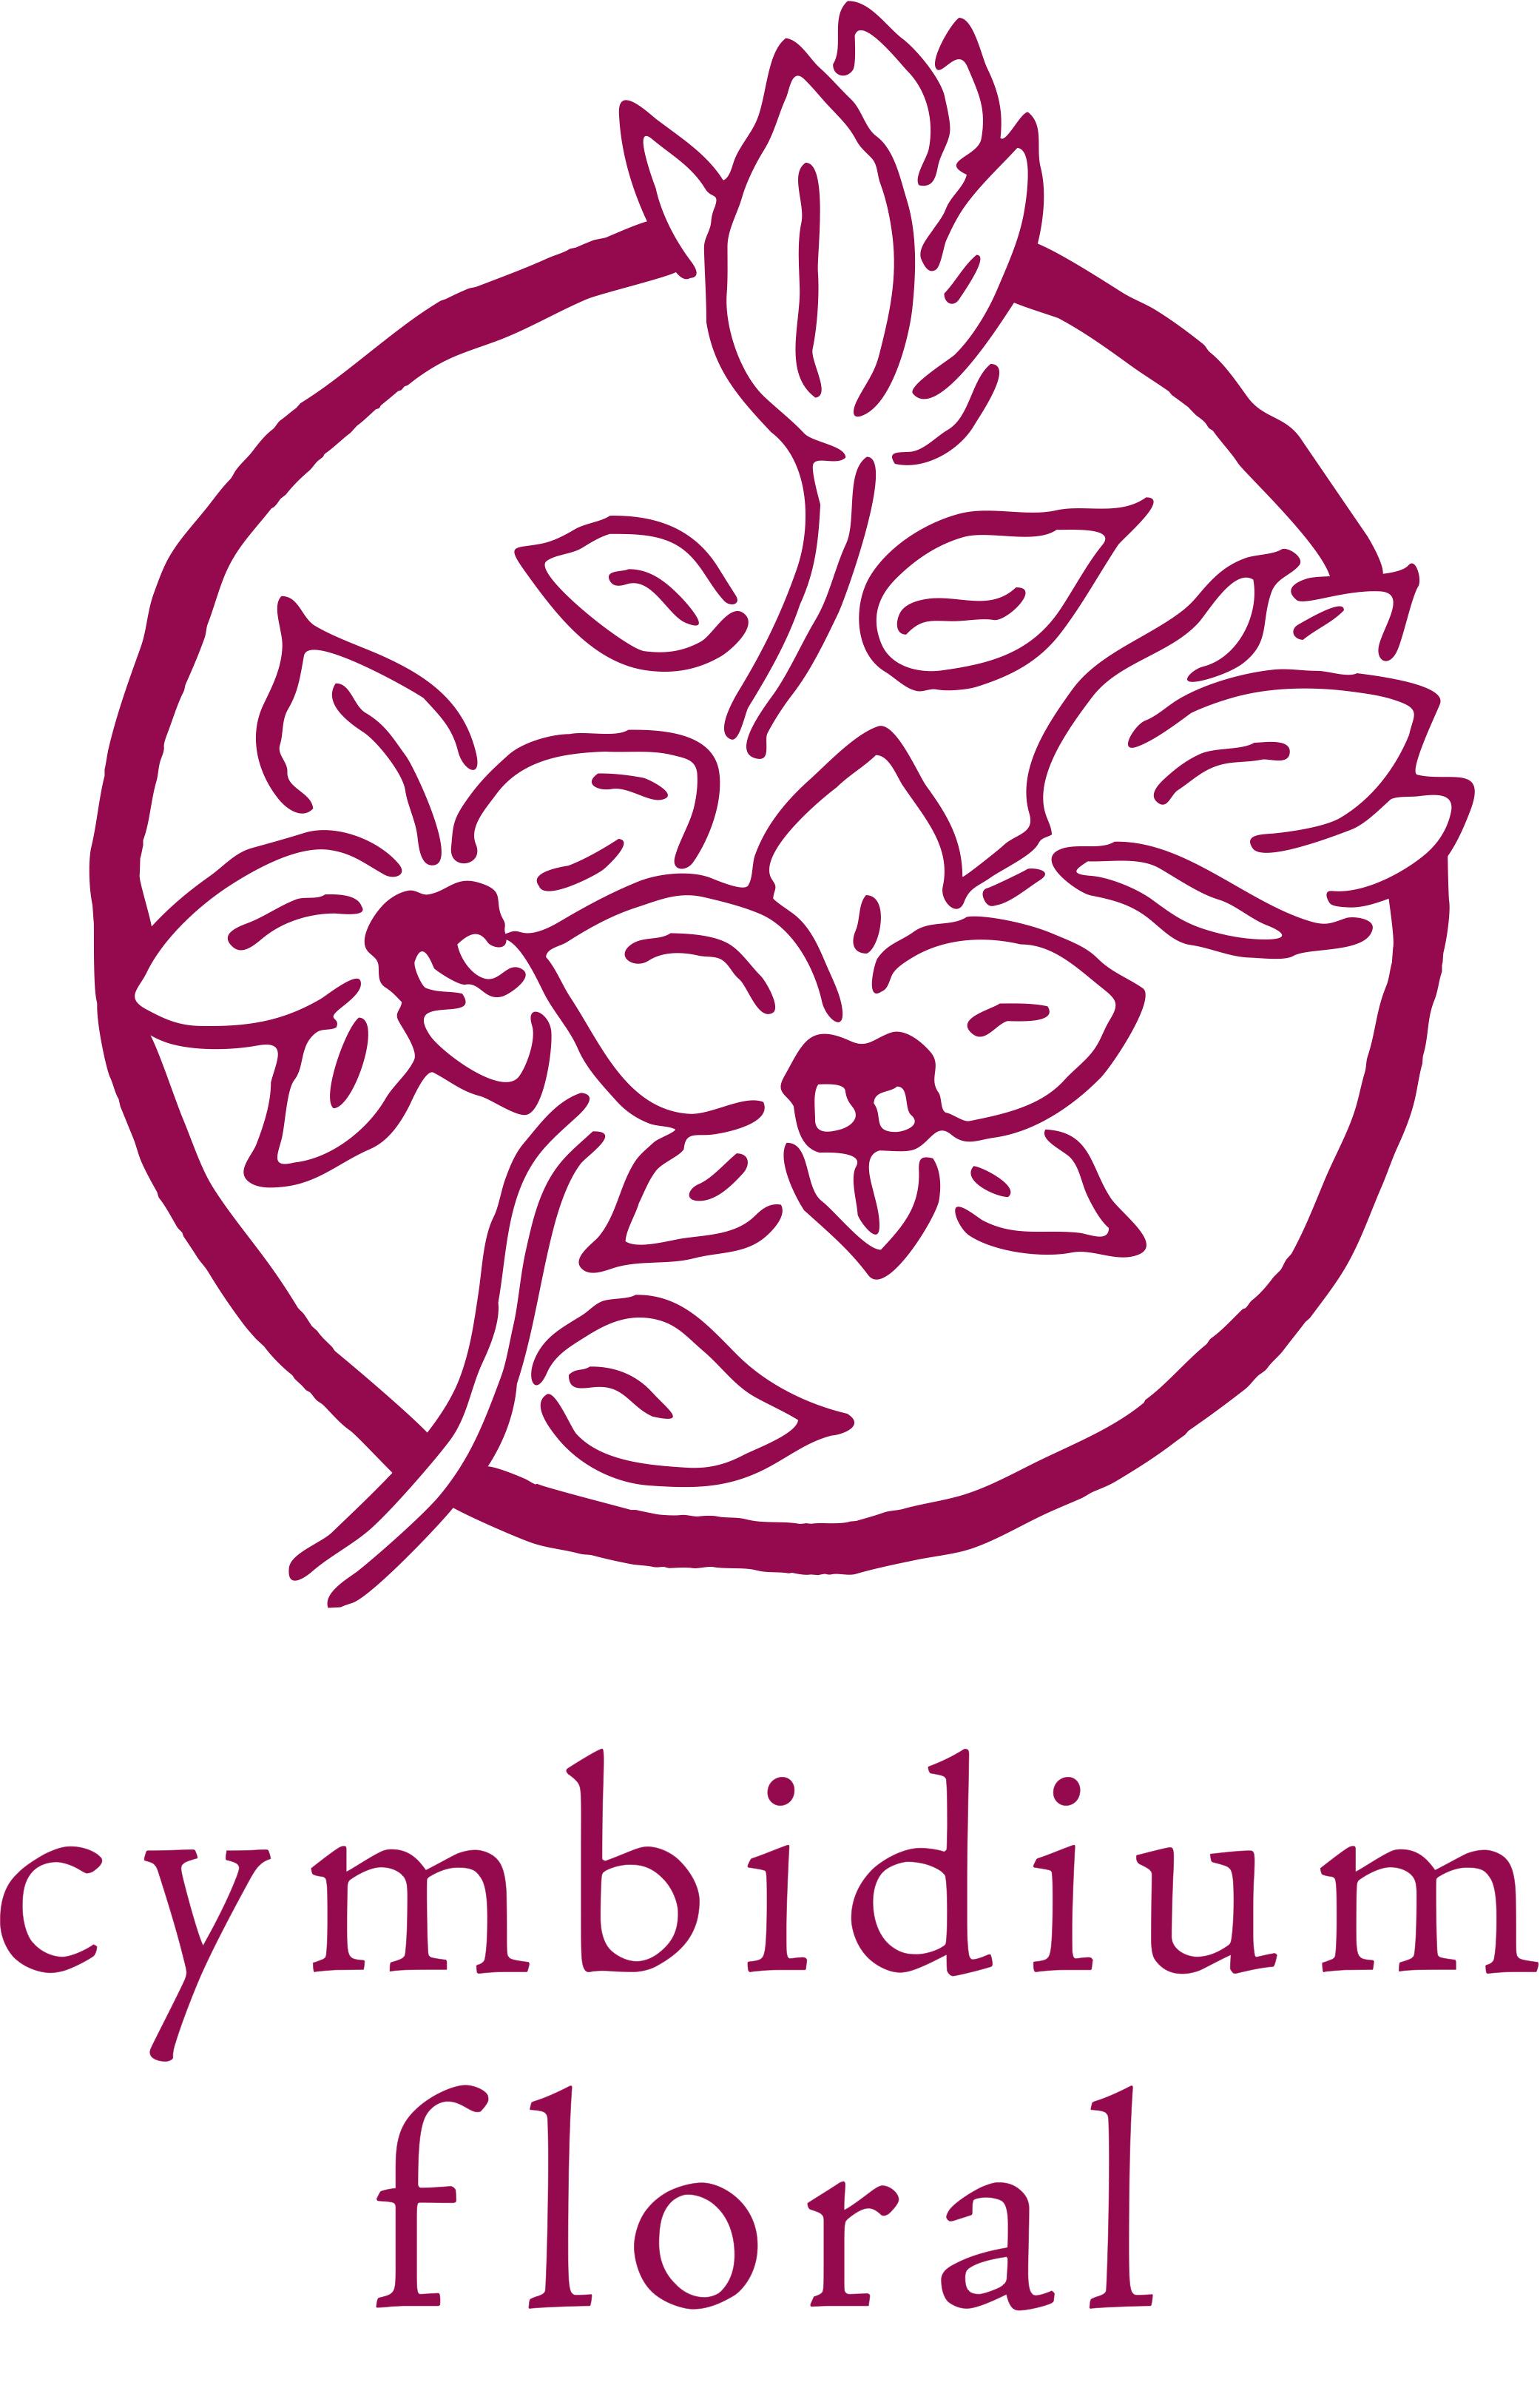 cymbidiumlogo_crop_highres-no-marks.jpg